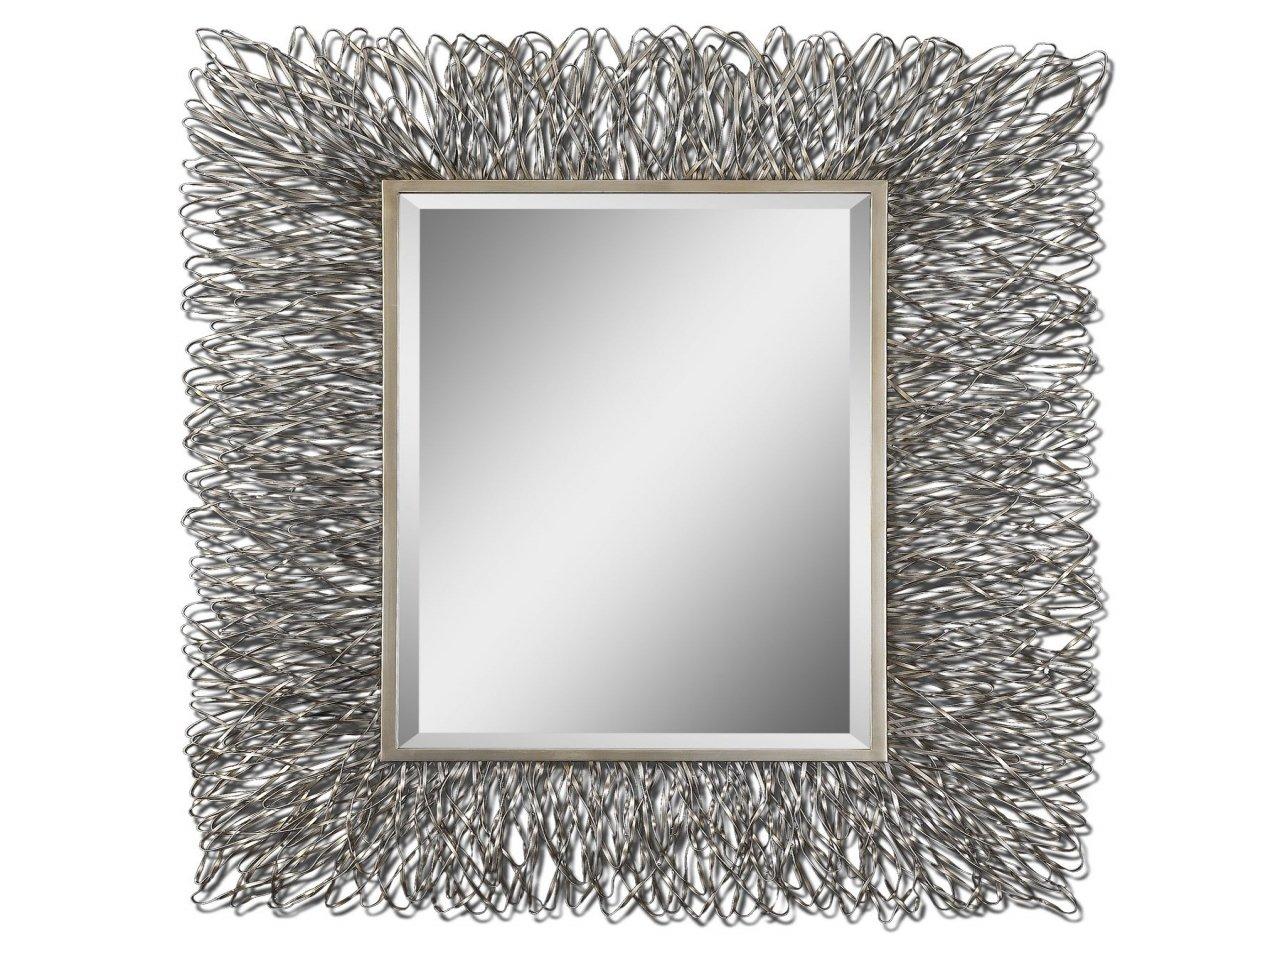 Decorative Wall Mirrors Wade Logan Decorative Wall Mirror Inside Boyers Wall Mirrors (Image 10 of 20)